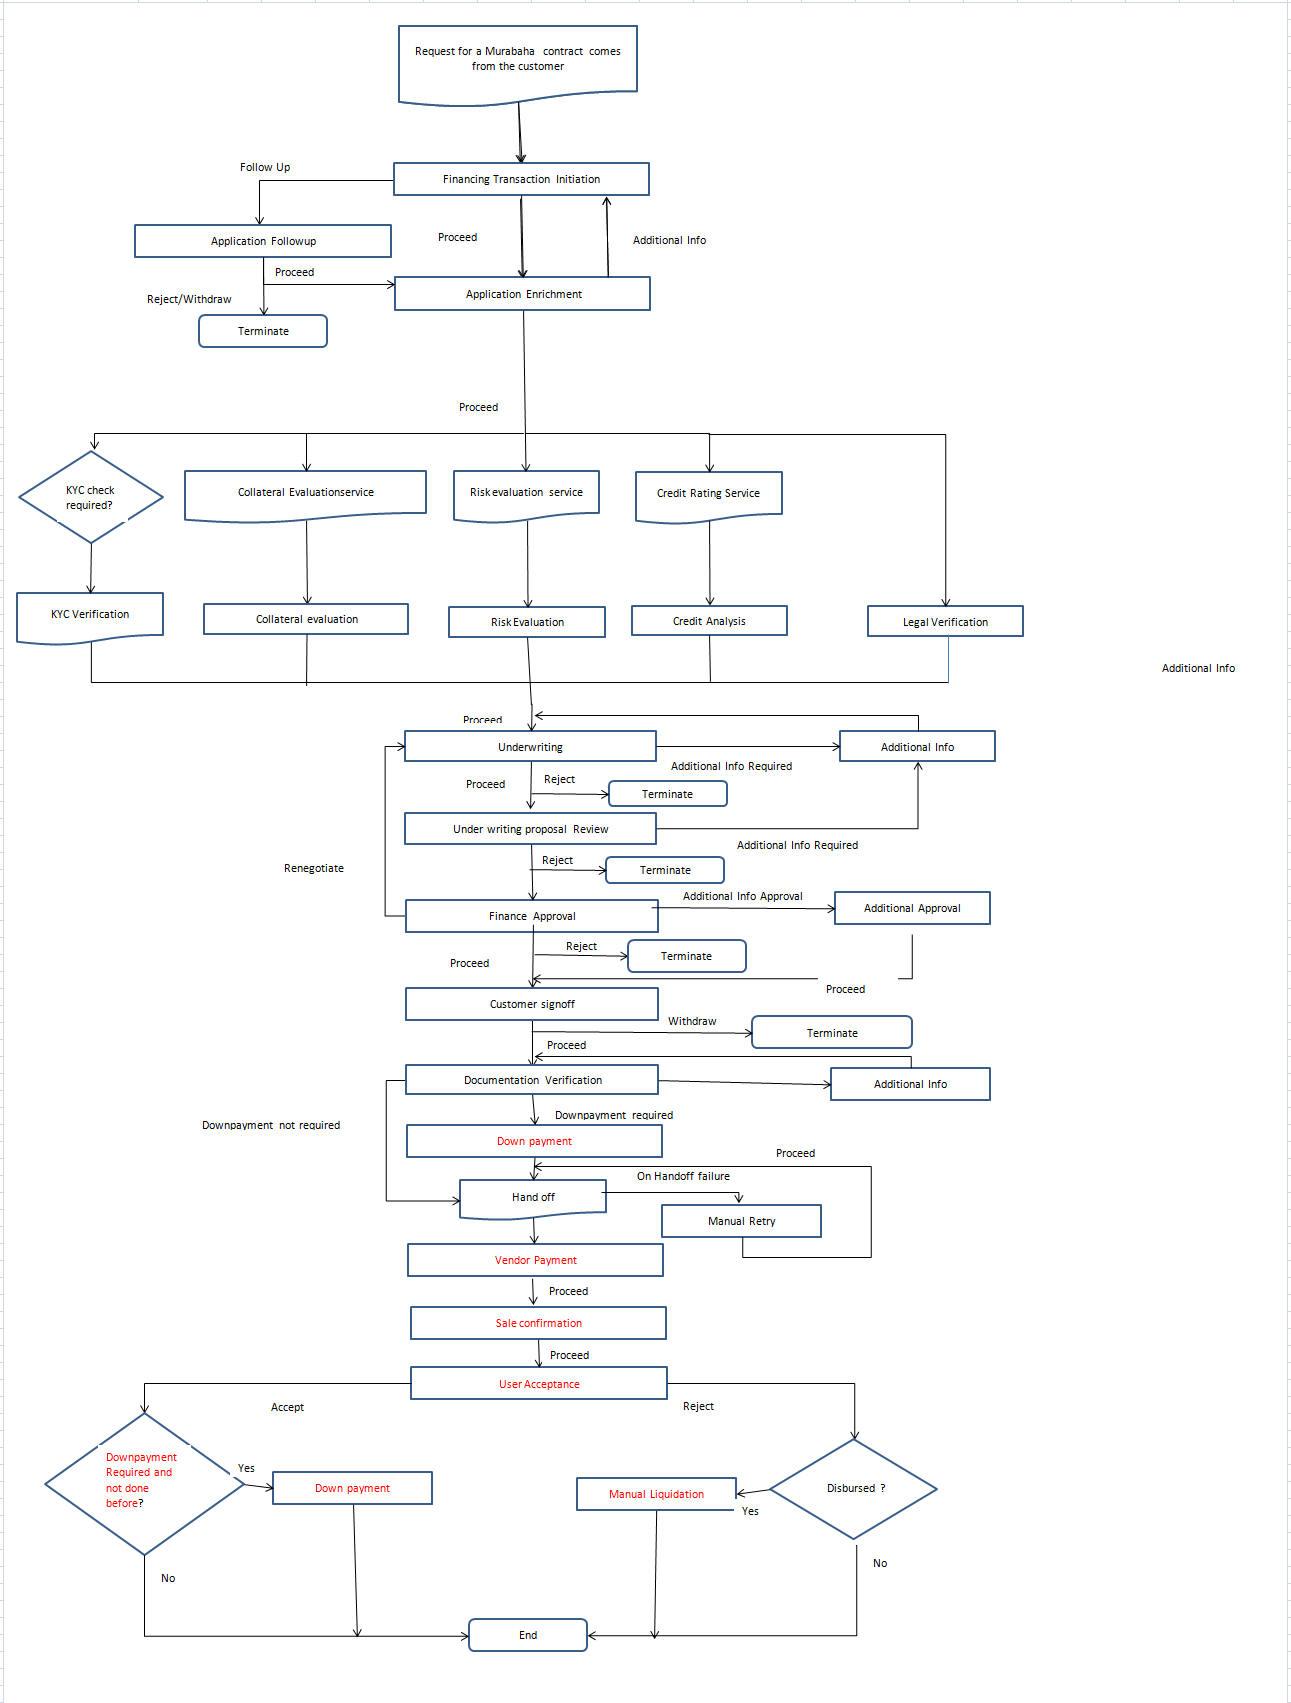 2 Murabaha Origination Process Flow Diagram Drawing Images 2261